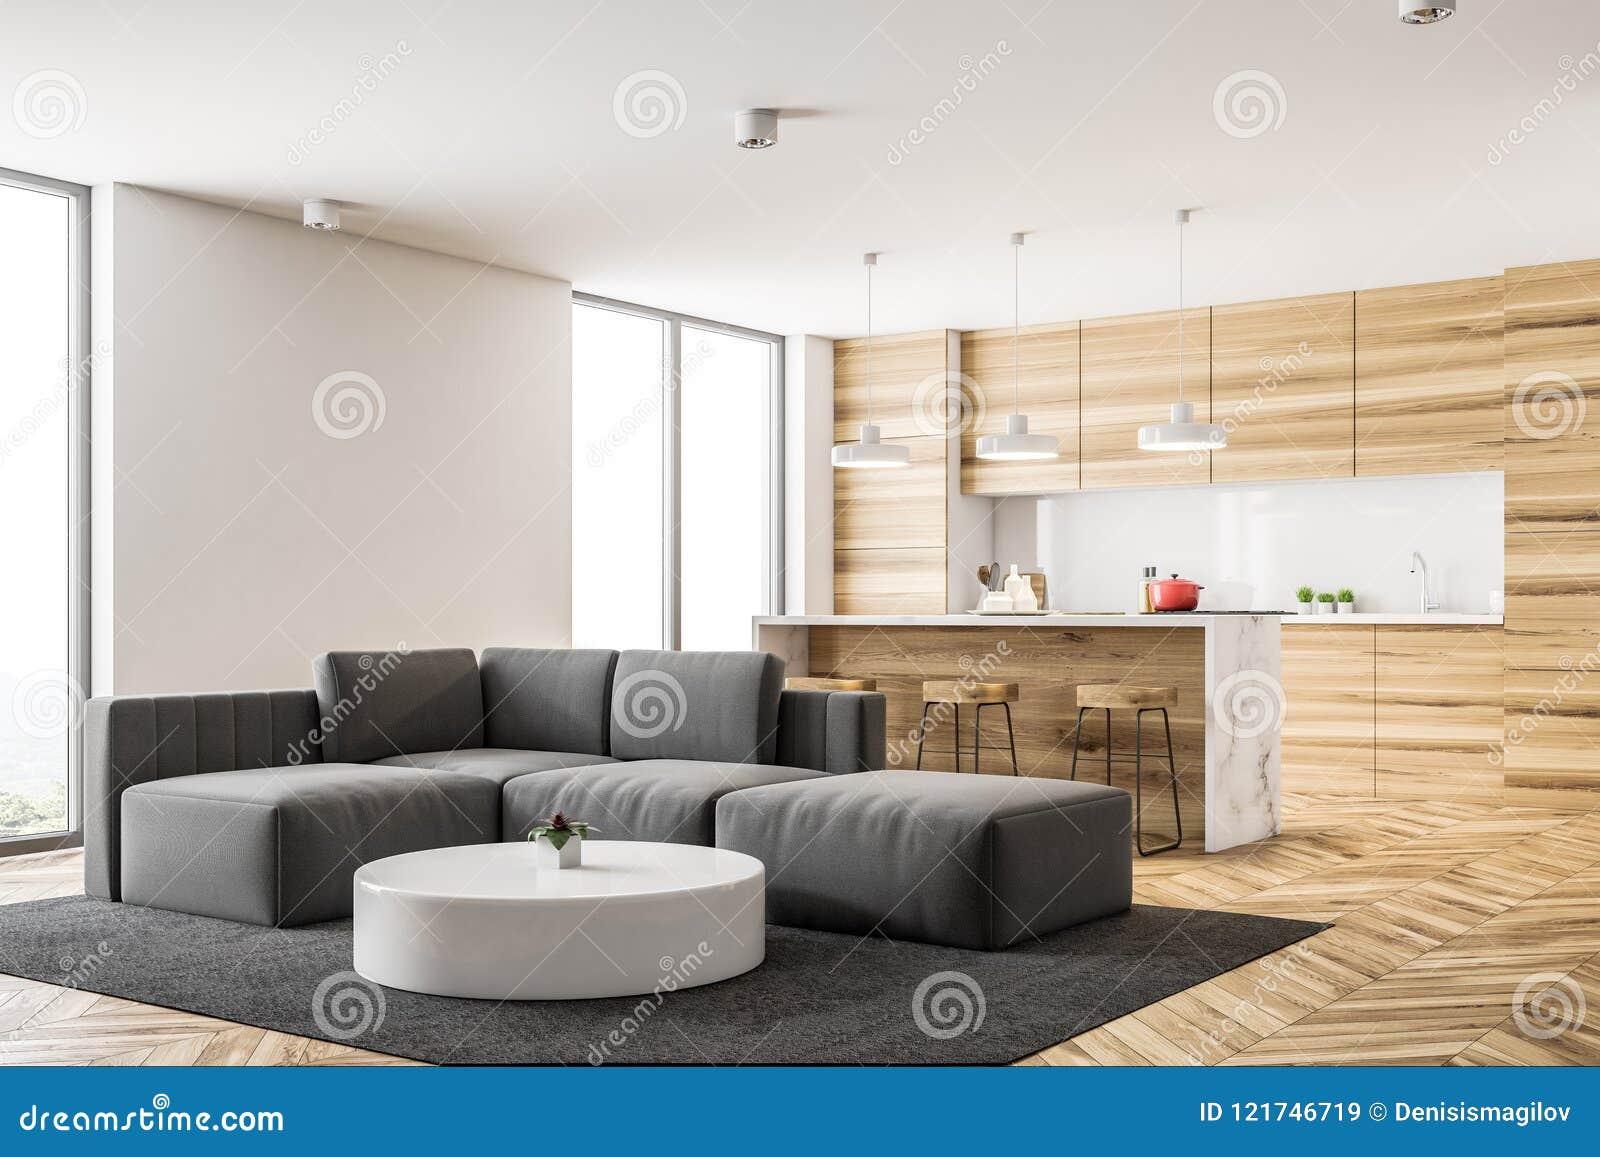 Picture of: Wooden Kitchen And Living Room Corner Stock Illustration Illustration Of Floor Mockup 121746719